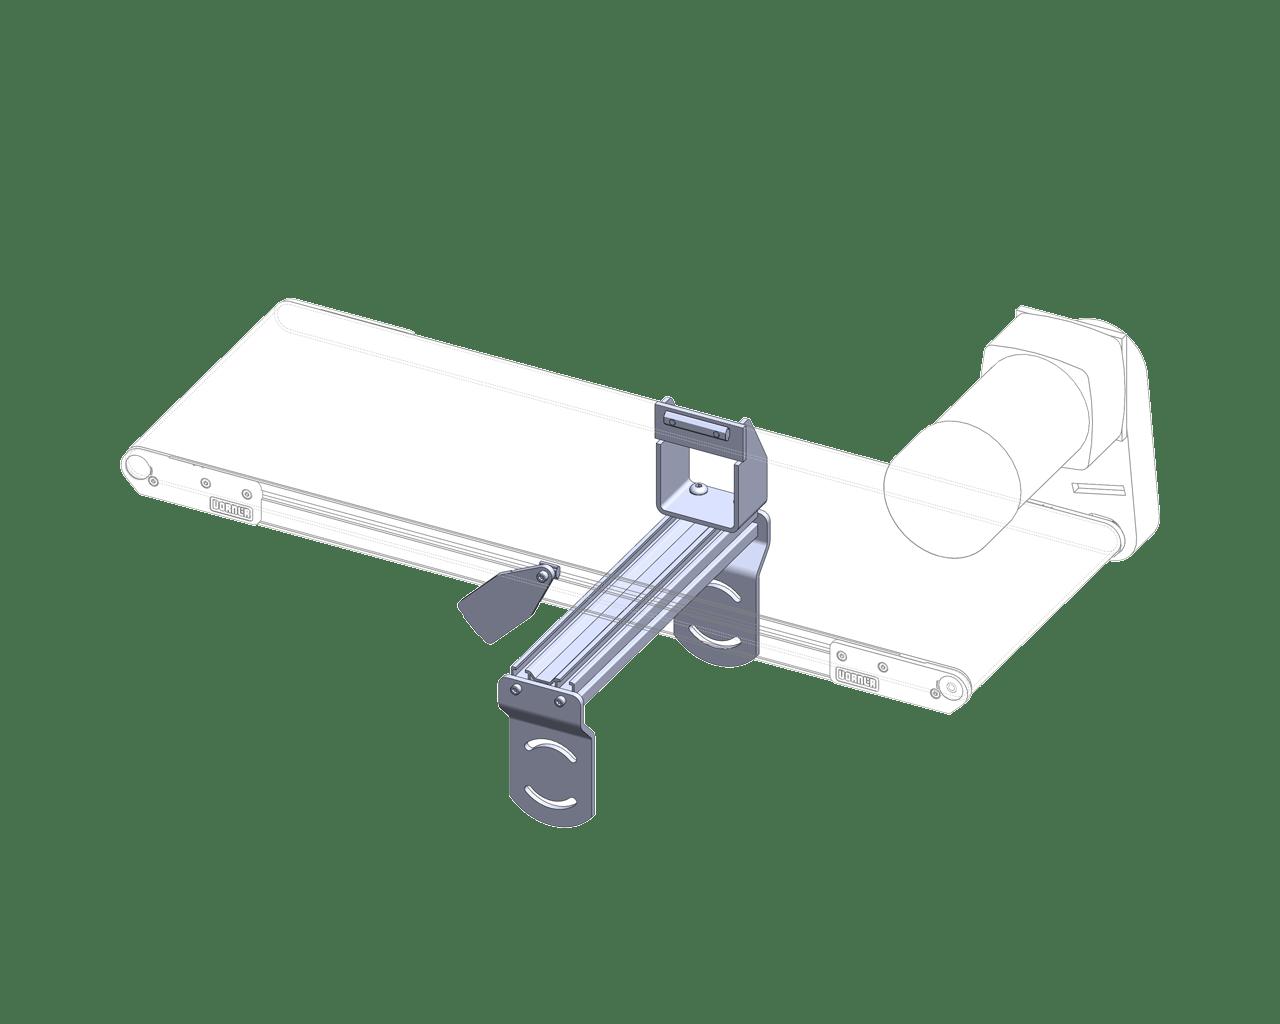 Dorner Mfg. Corp. > Products > 2X Series Conveyors > 2200